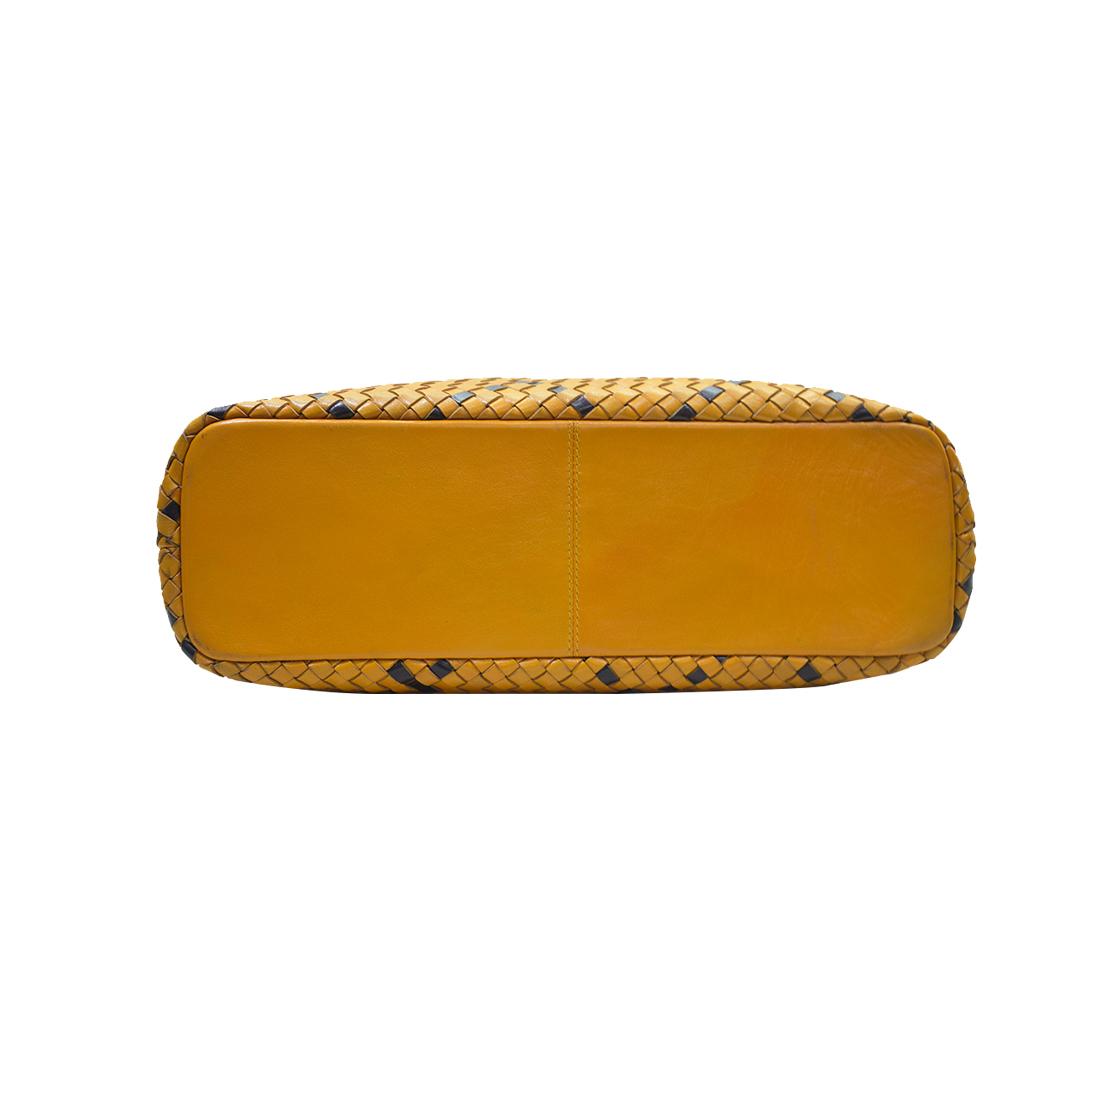 Trishikha Leather Hand Woven Shoulder Bag